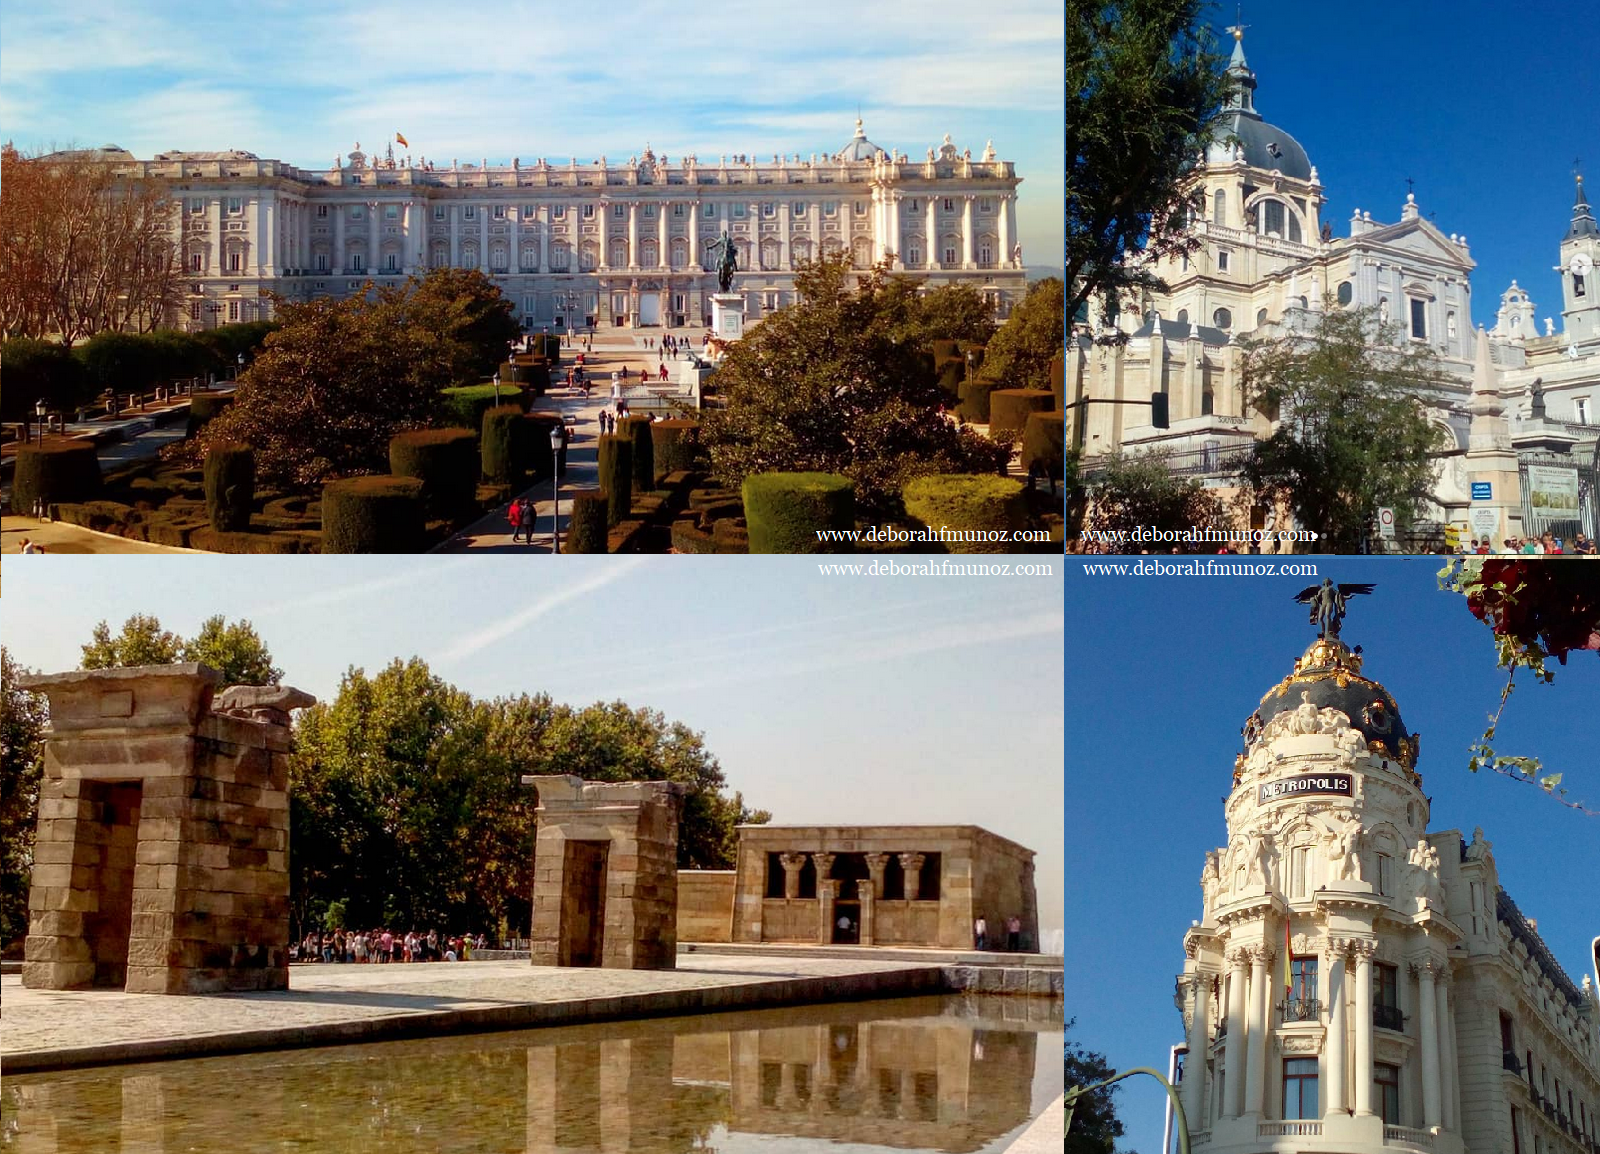 ruta por Madrid - Palacio, Almudena, Templo de Debod, Edificio Metrópolis Gran Vía